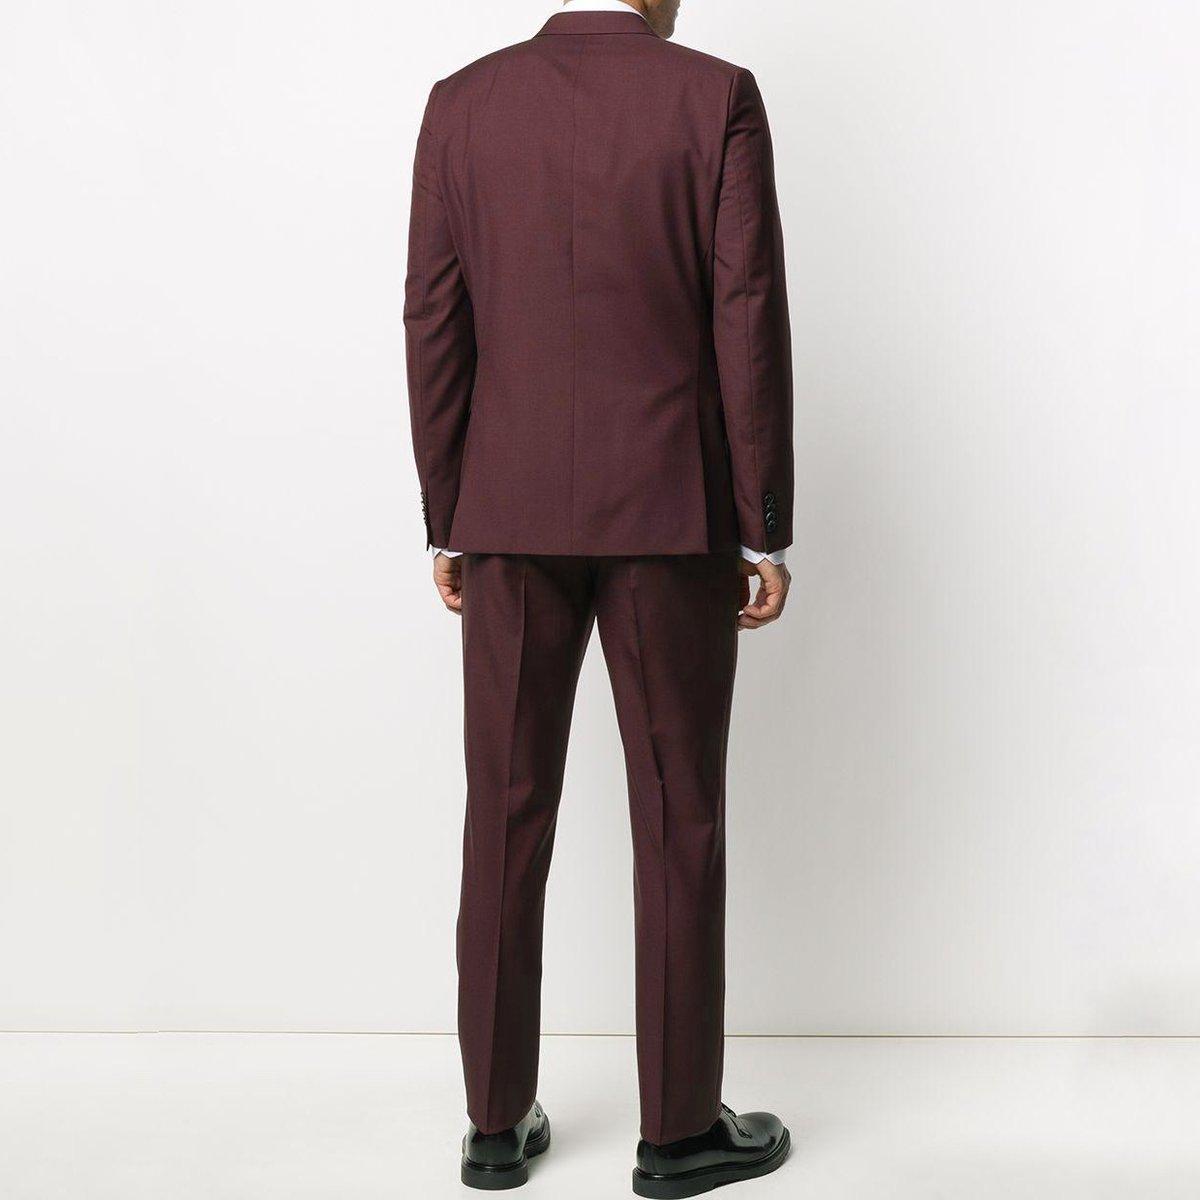 paul-smith-purple-Slim-fit-Two-piece-Suit (2).jpg